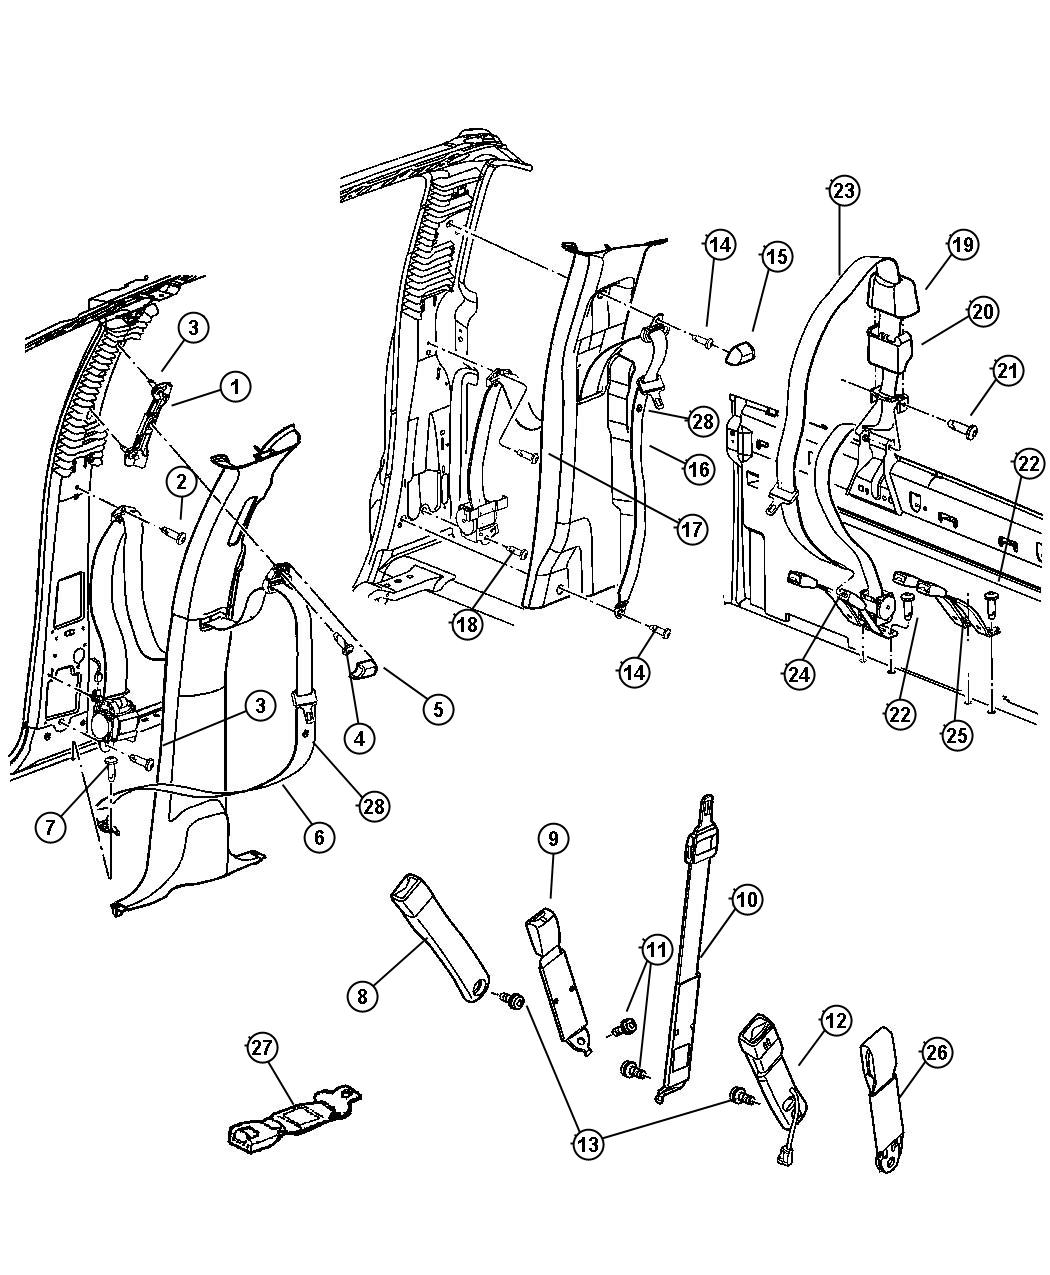 Dodge Ram 2500 Seat belt. Rear. [l5], after 8/26/02. Trim